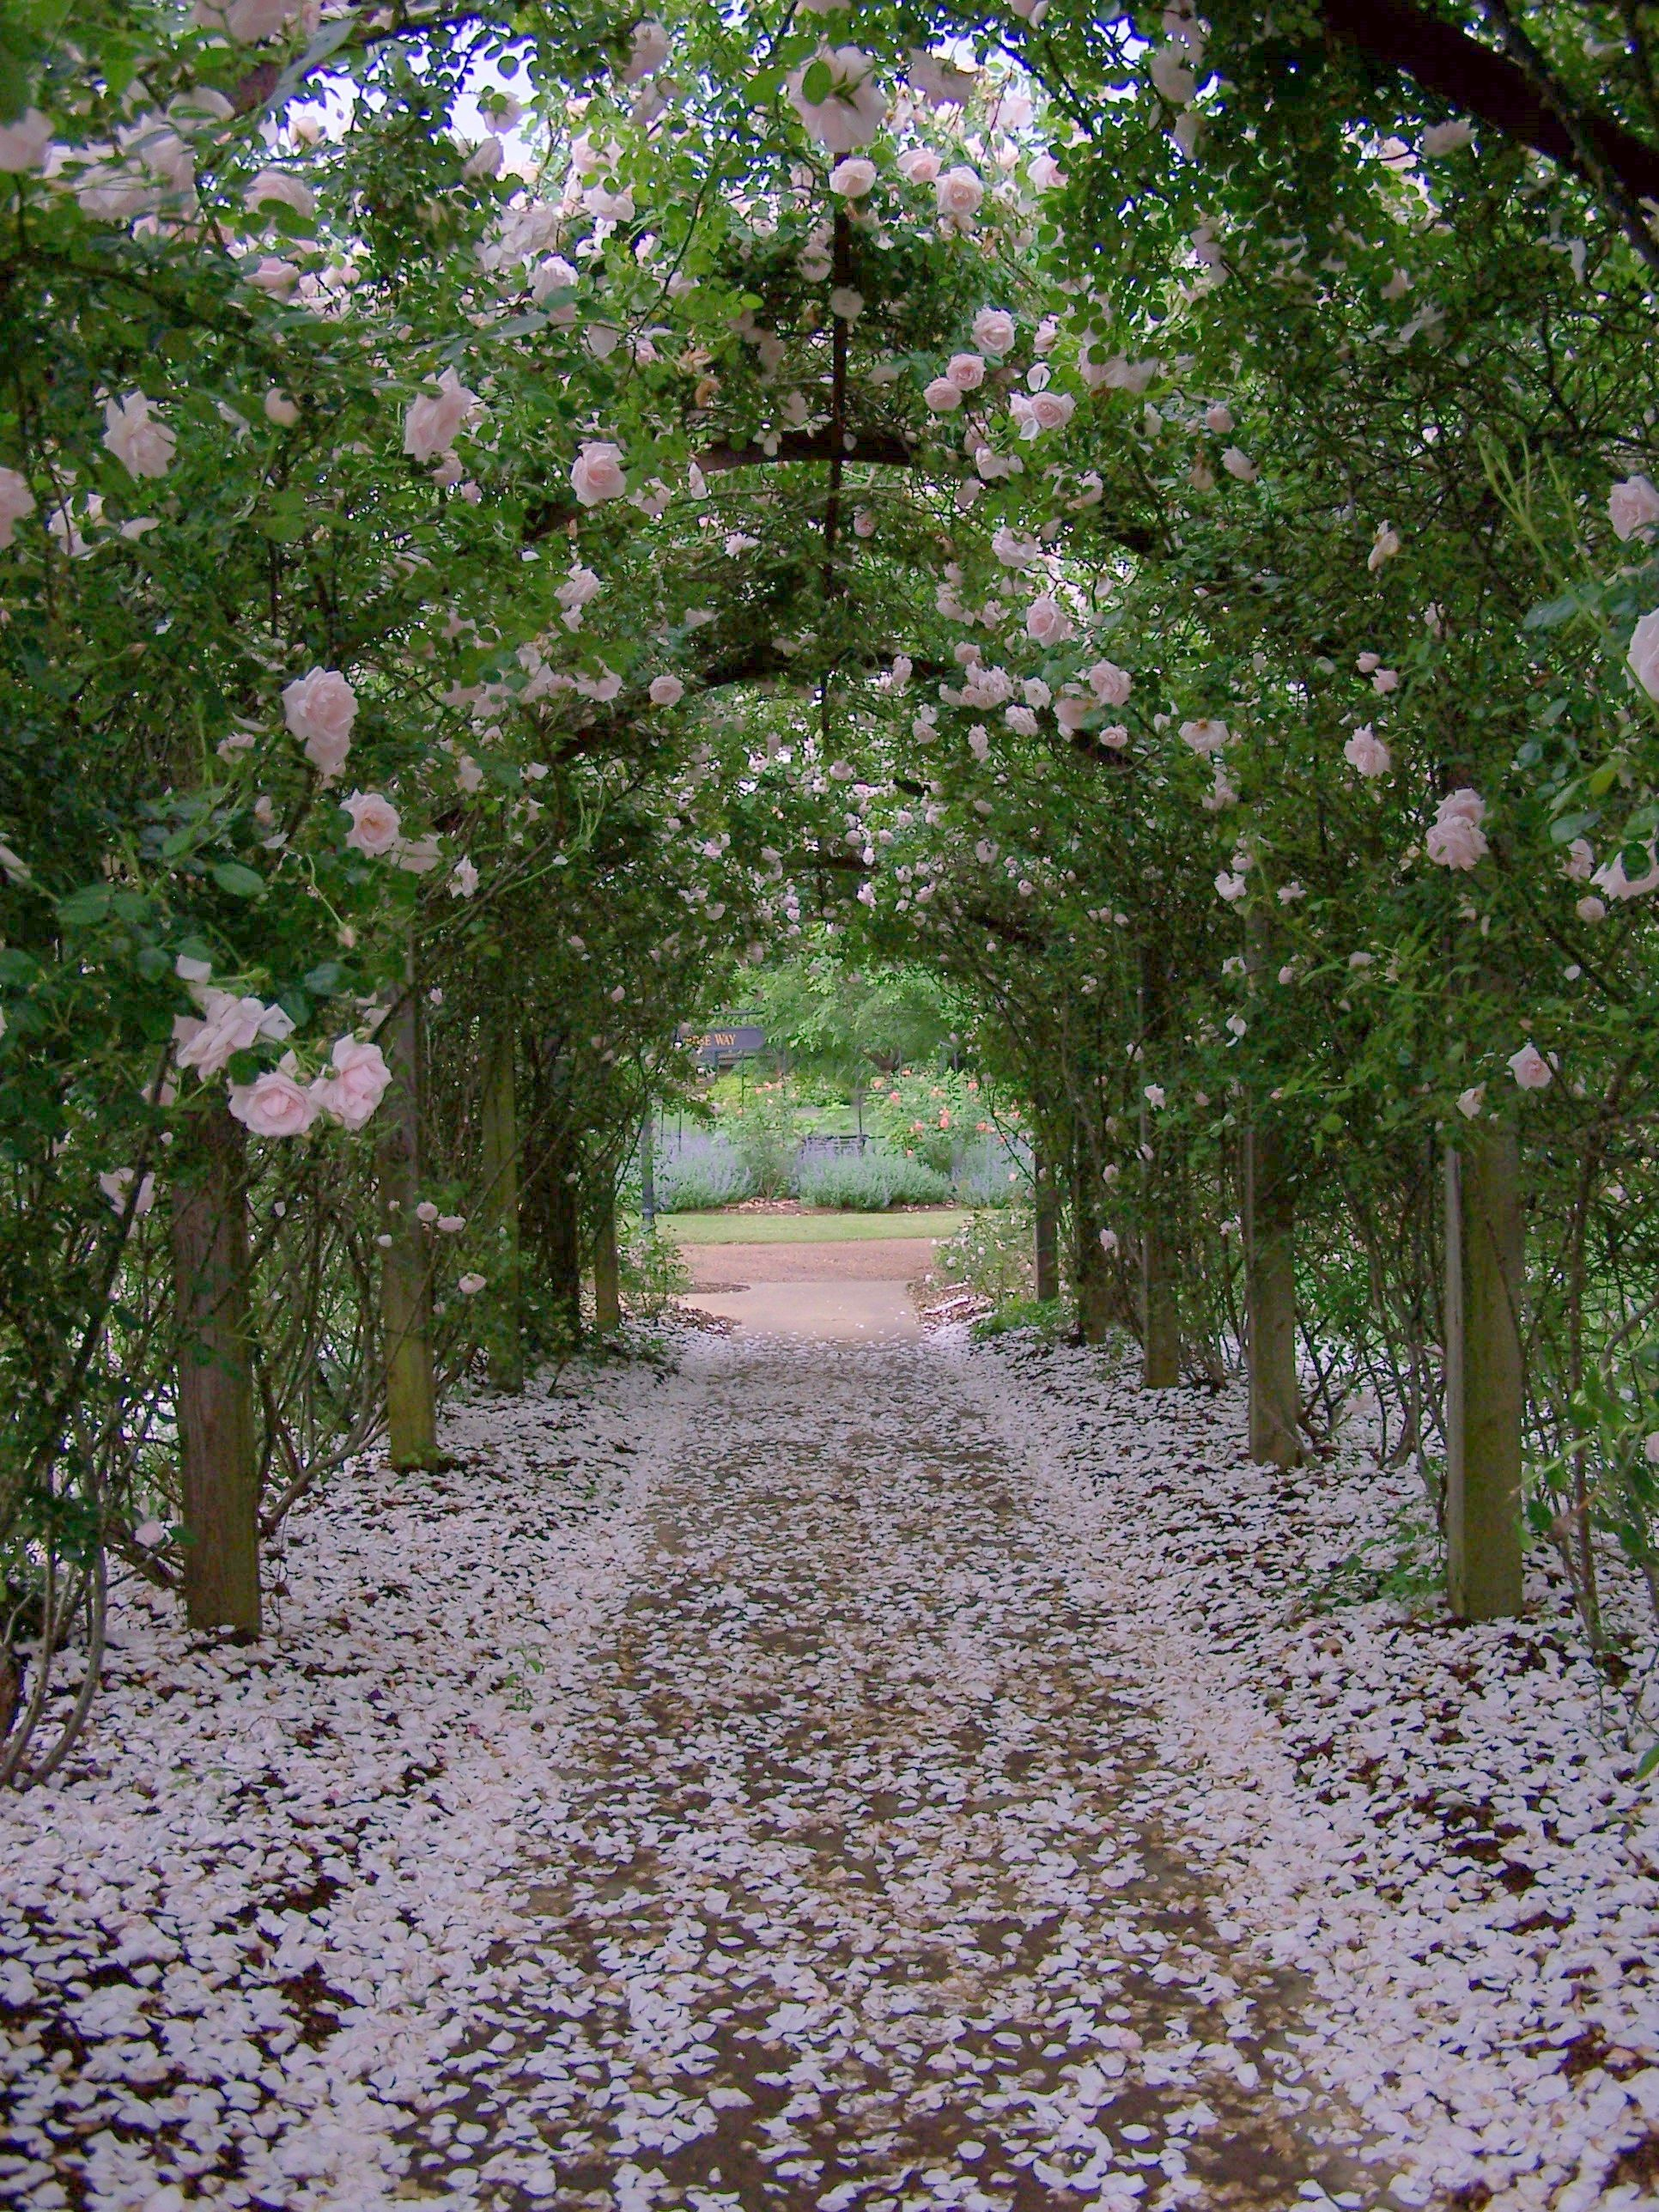 d0a5233769a5827afcc6f17532752efd - Barnsley Gardens Resort In Adairsville Ga